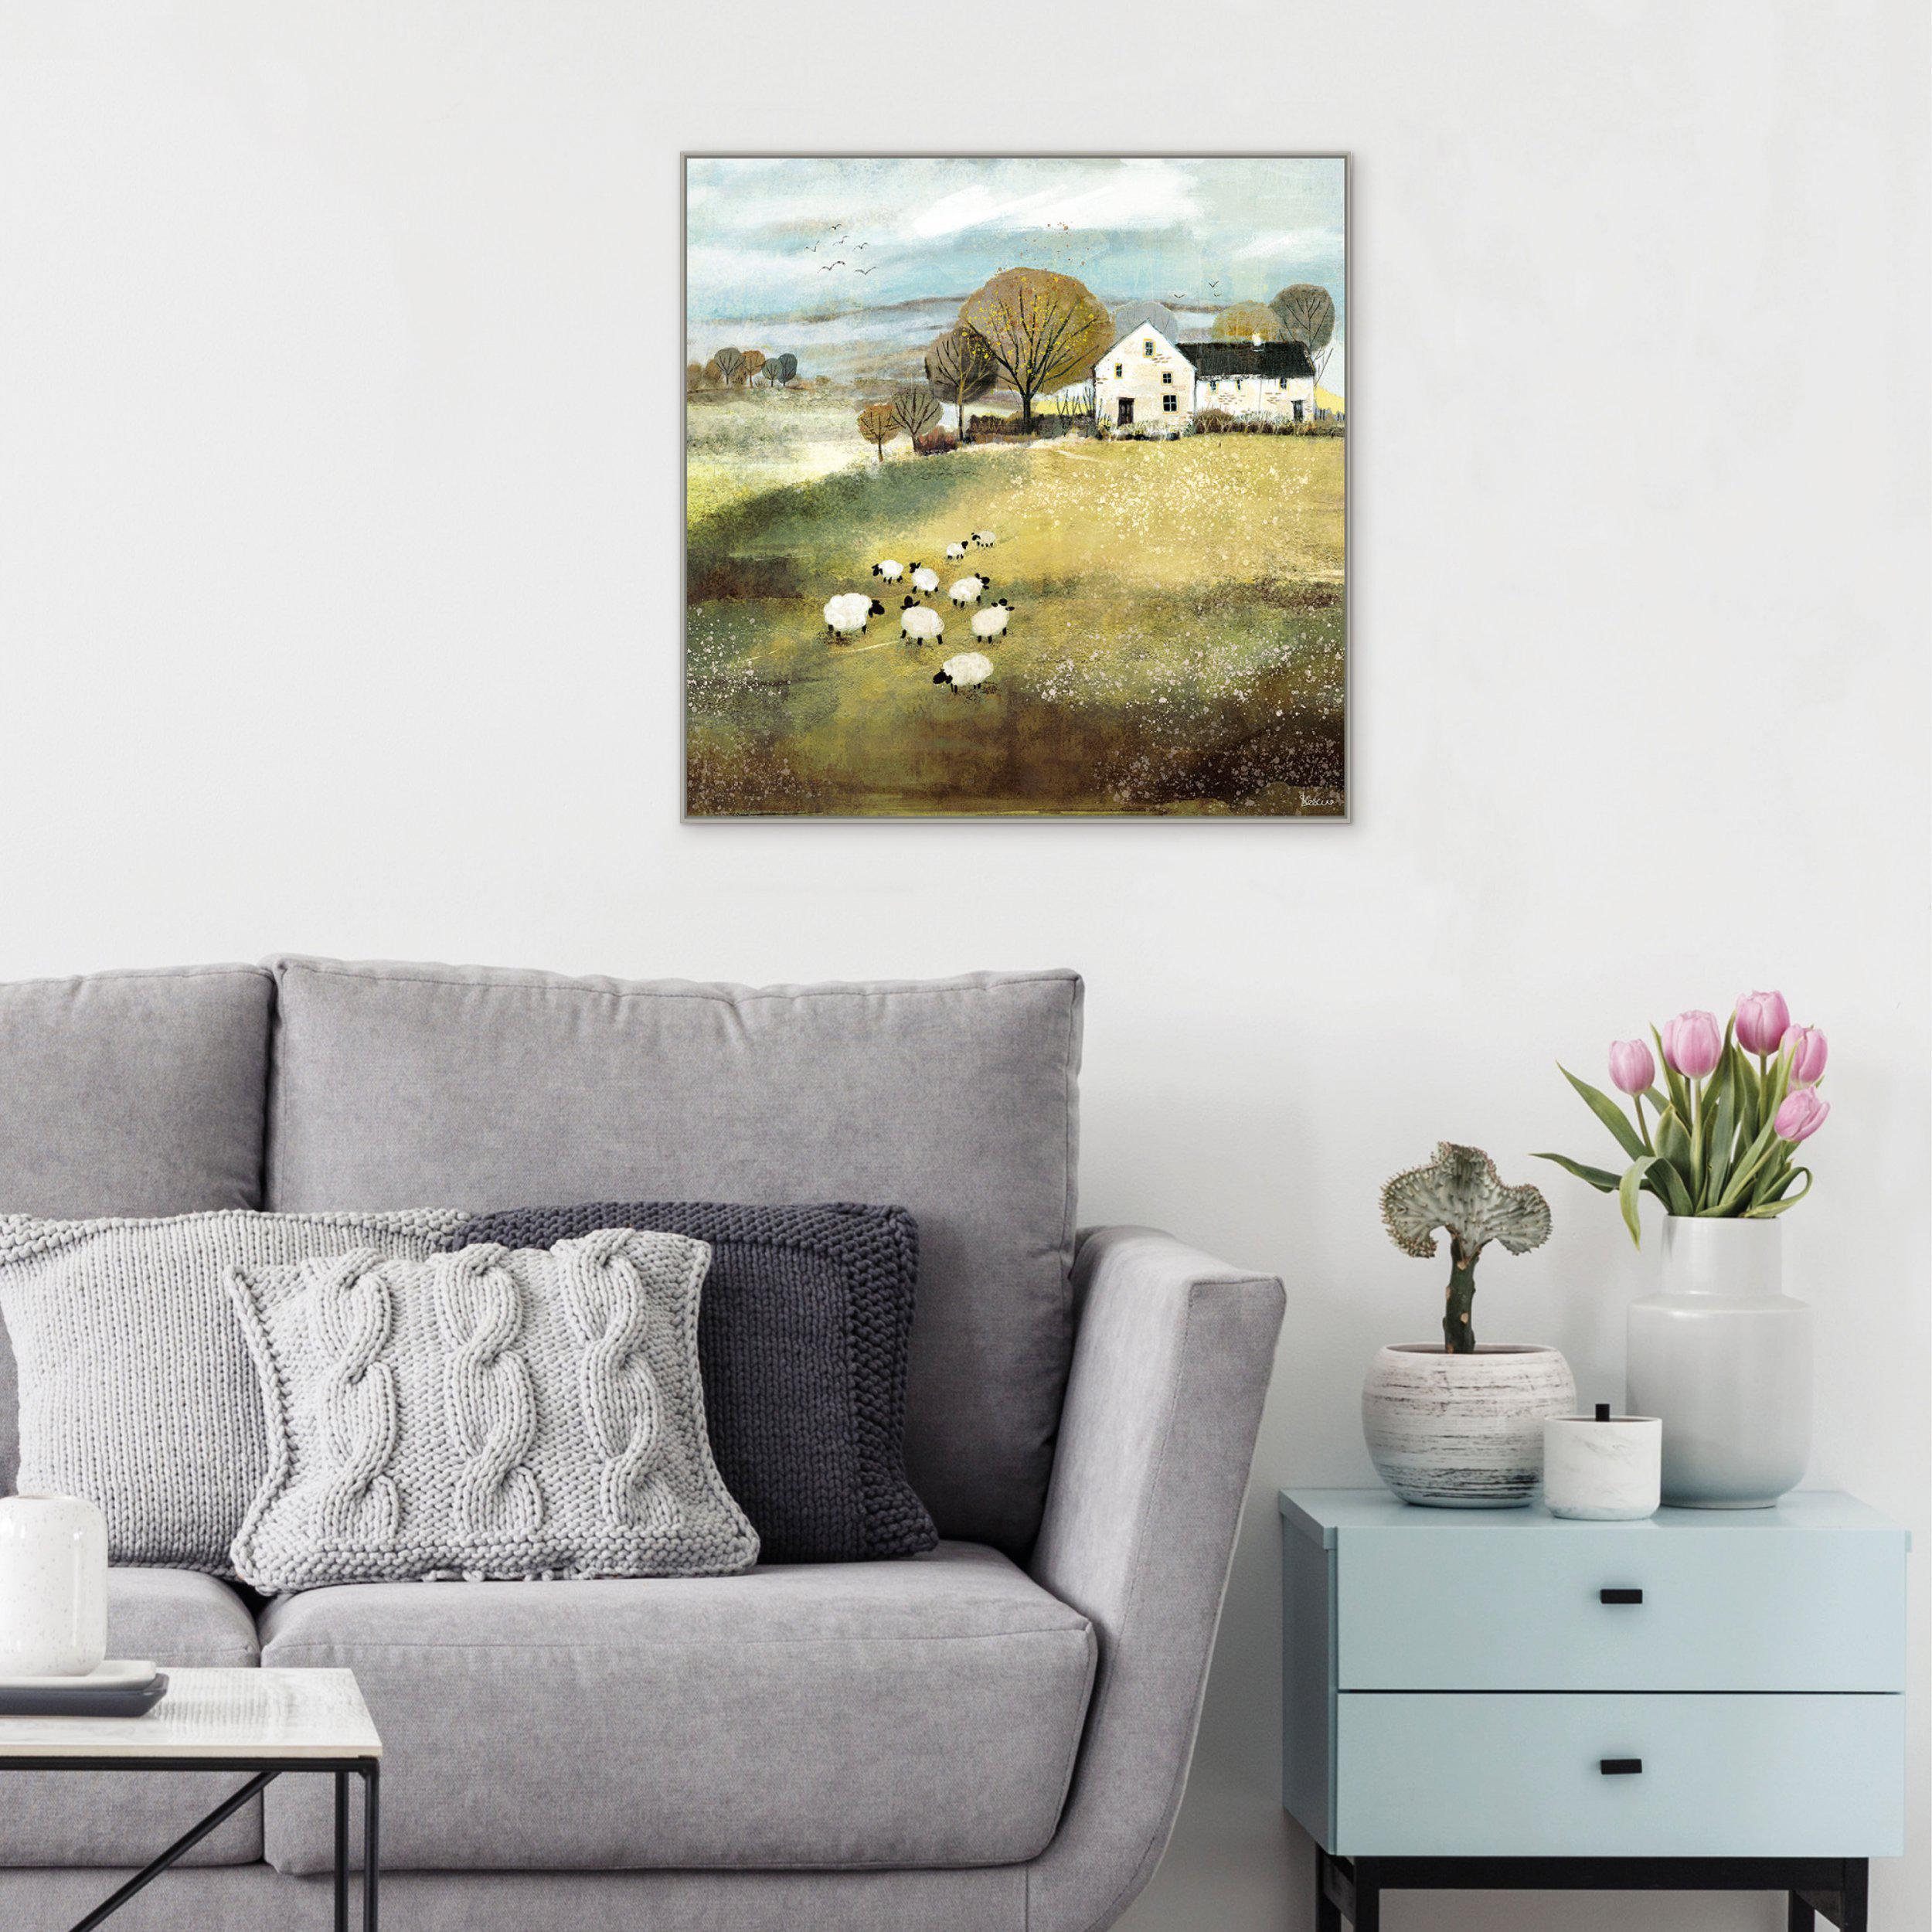 Art Gallery - Home Farm - Sheep Flock Painting - Artist Sabrina Roscino - Framed Print For Sale - Room Display